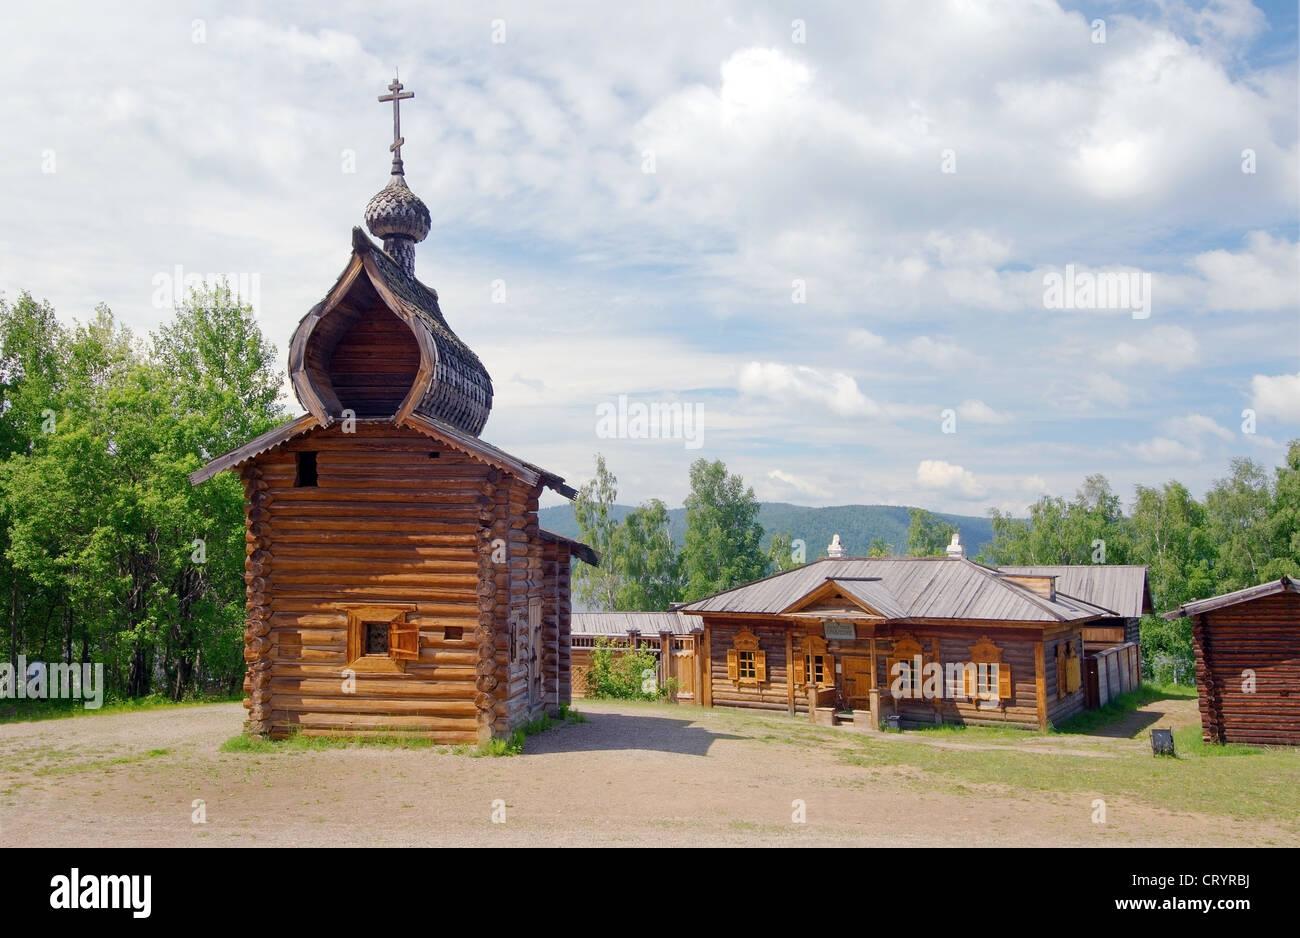 Kazan church of the Ylym jail, 1679. 'Taltsa's' (Talzy) - Irkutsk architectural and ethnographic museum. - Stock Image